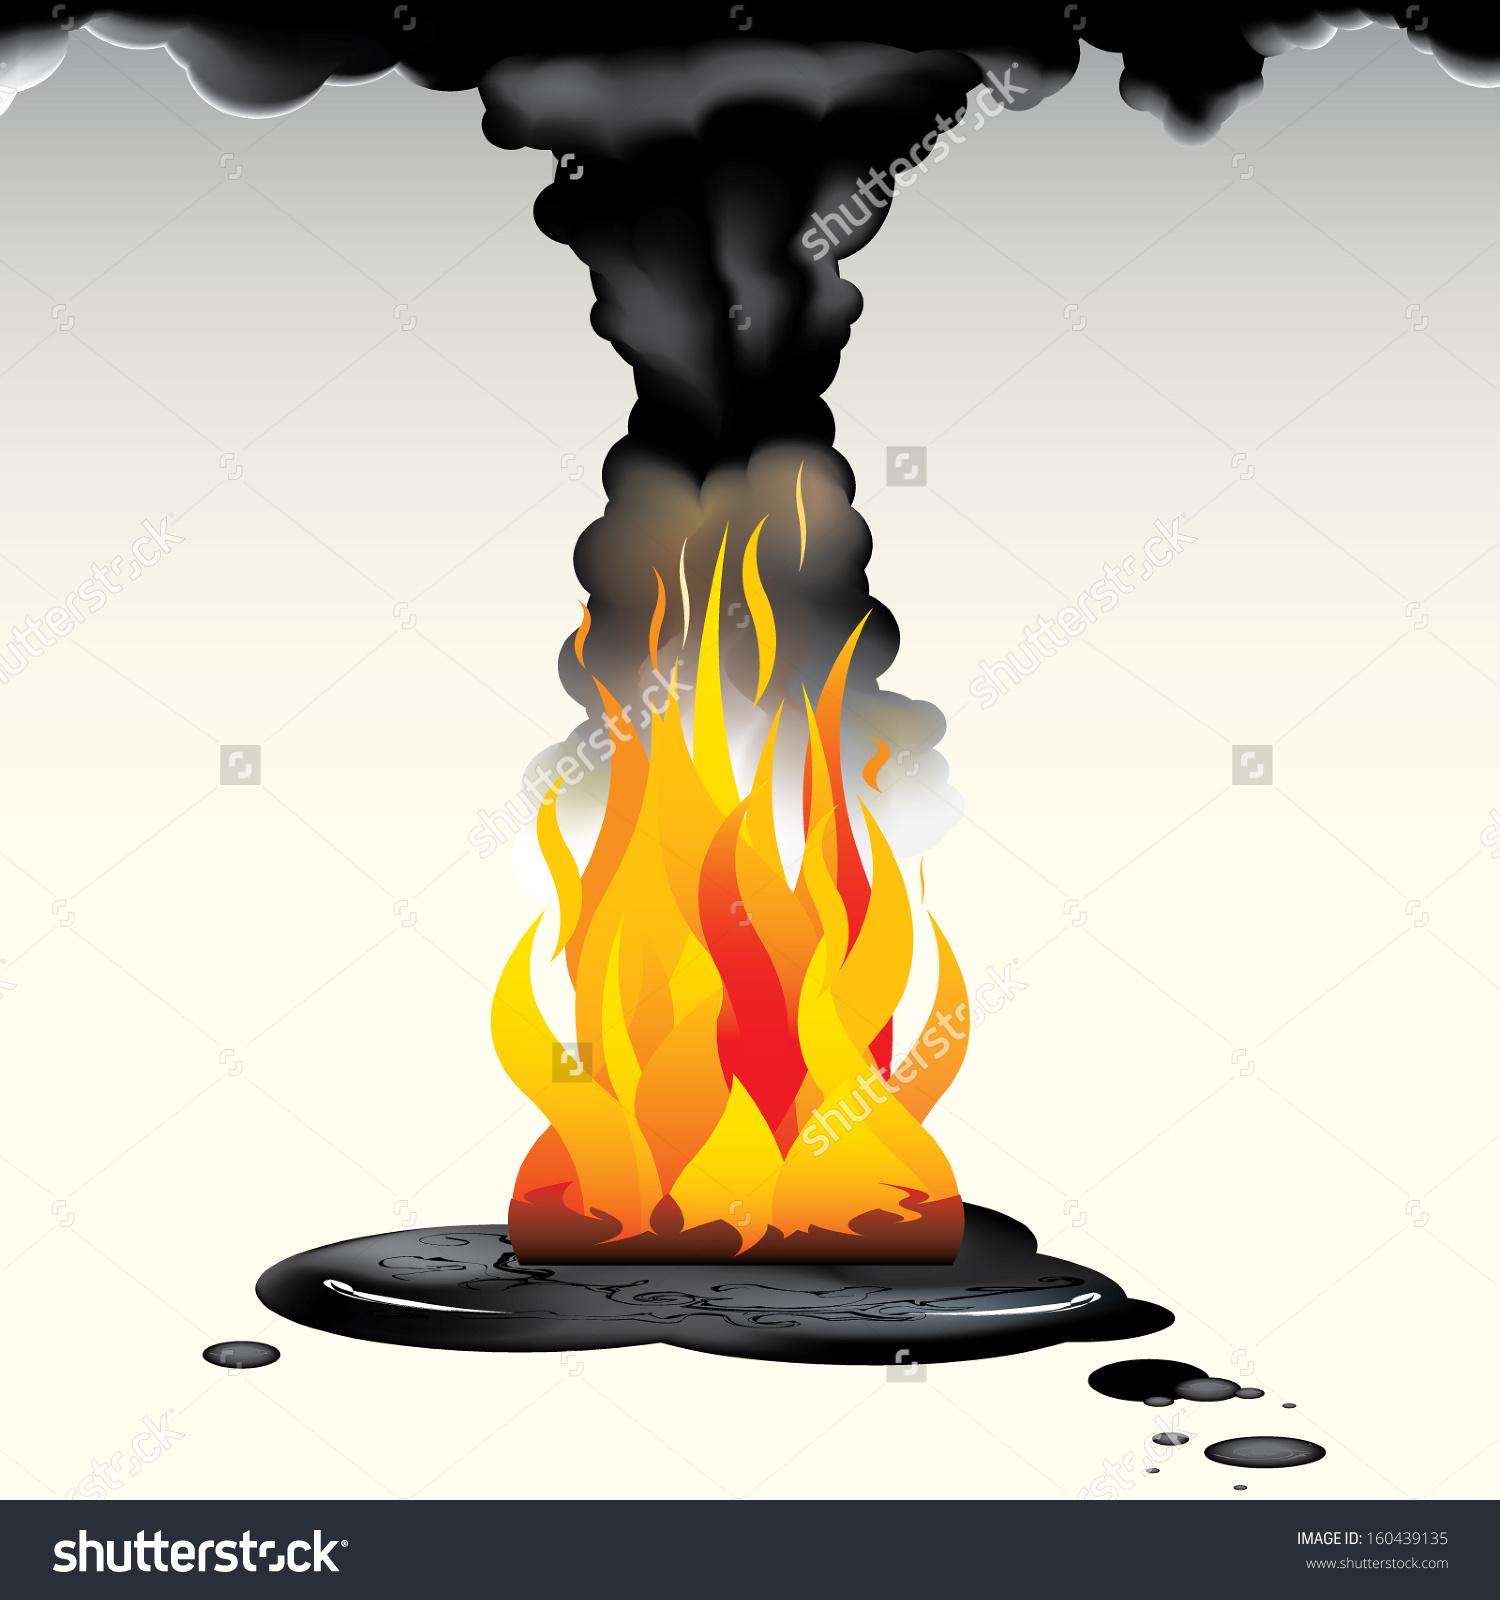 Vector Drawing Flames Burning Oilburning Oil Stock Vector.